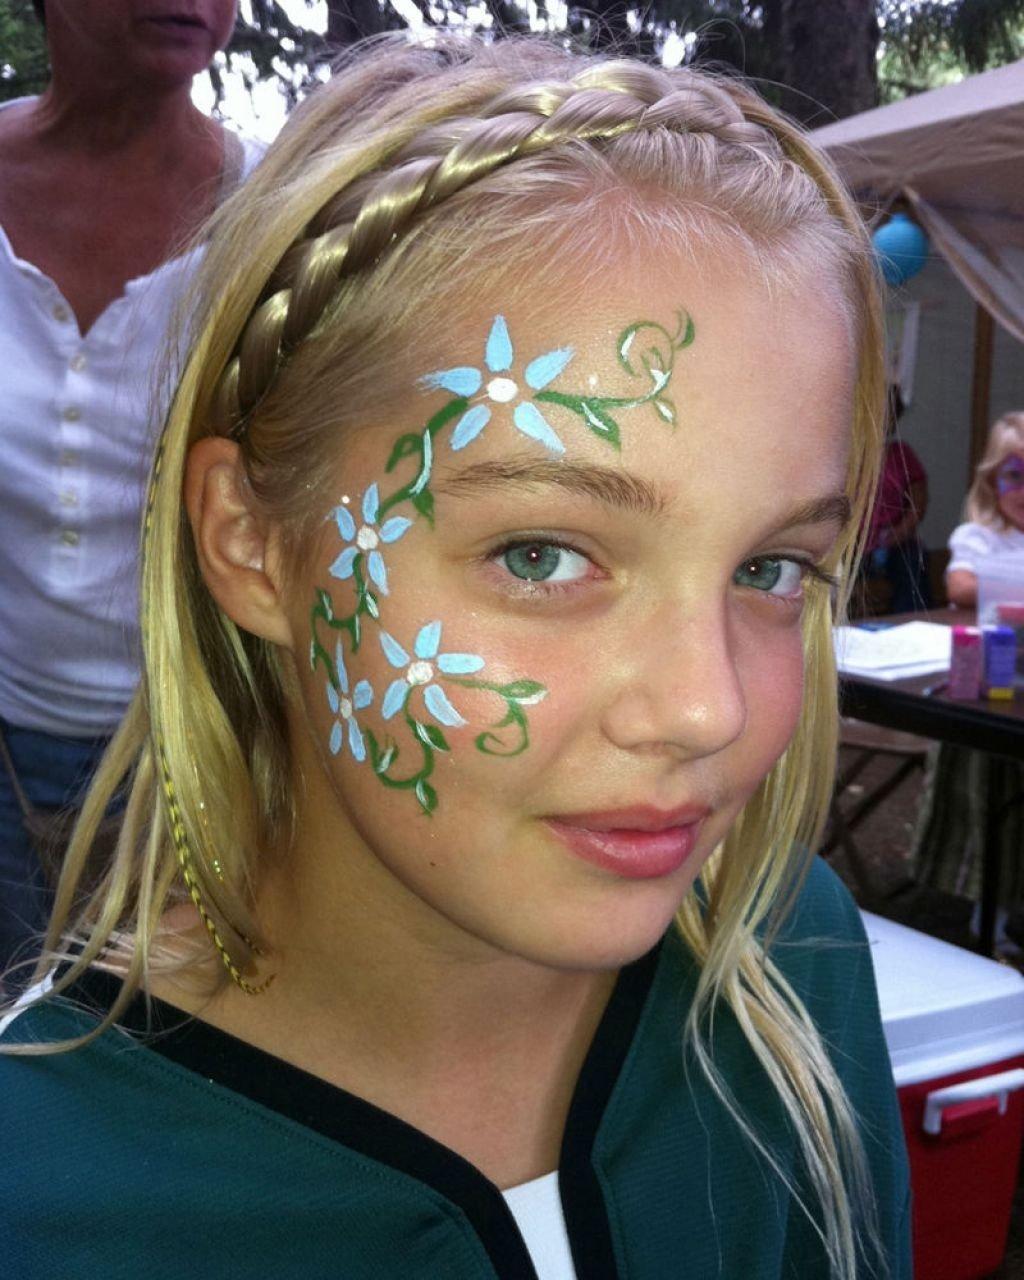 10 Lovely Face Paint Ideas For Girls flower face painting ideas face makeup ideas 1 2020